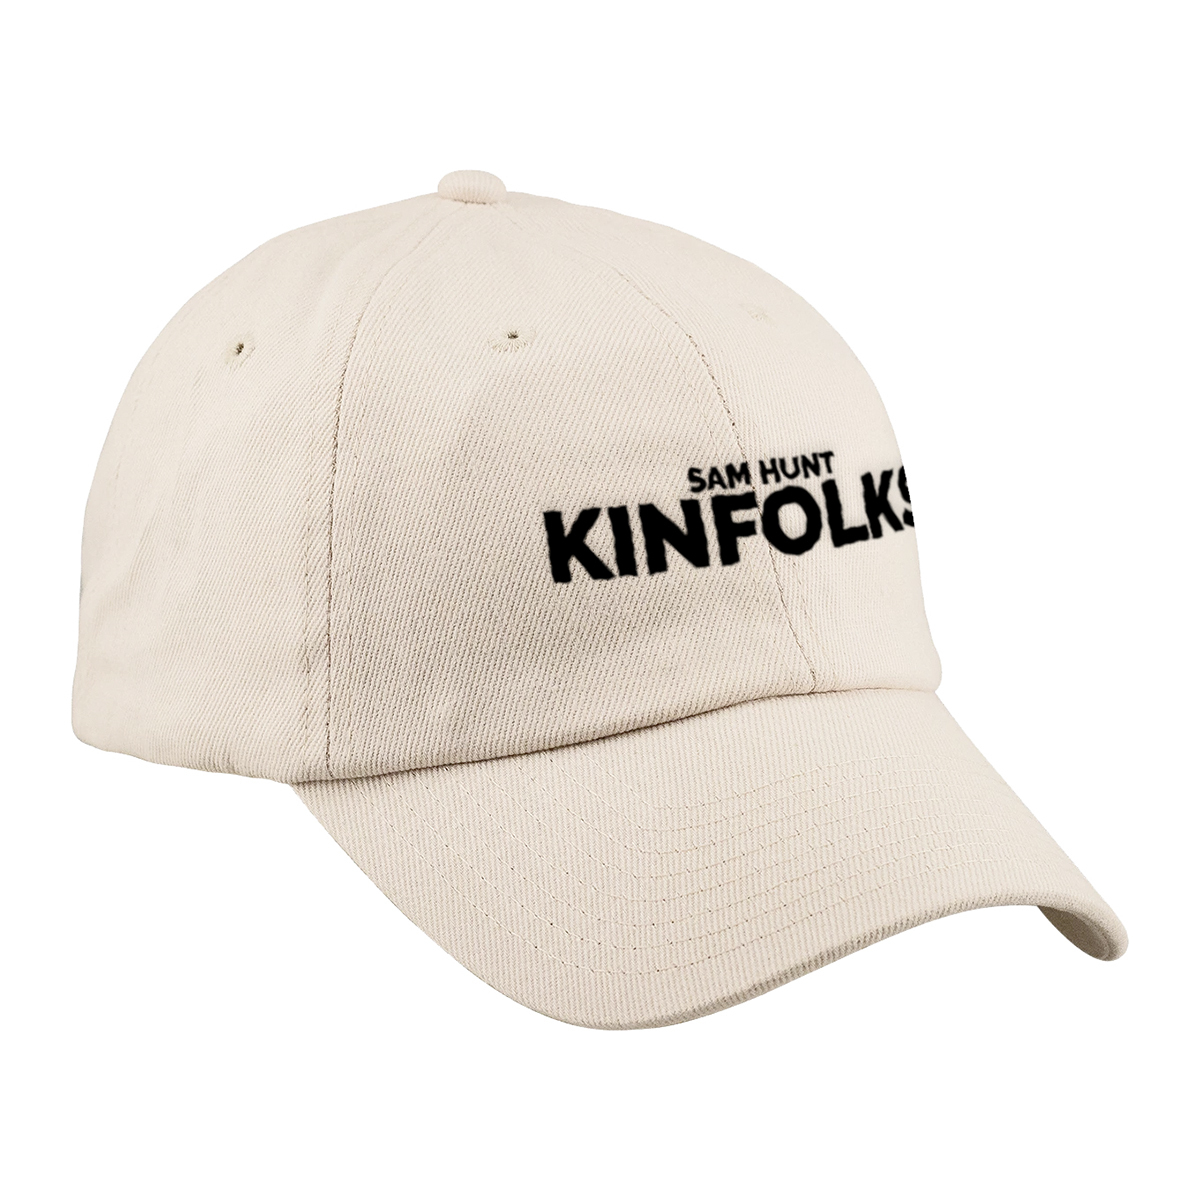 Tan Kinfolks Dad Hat